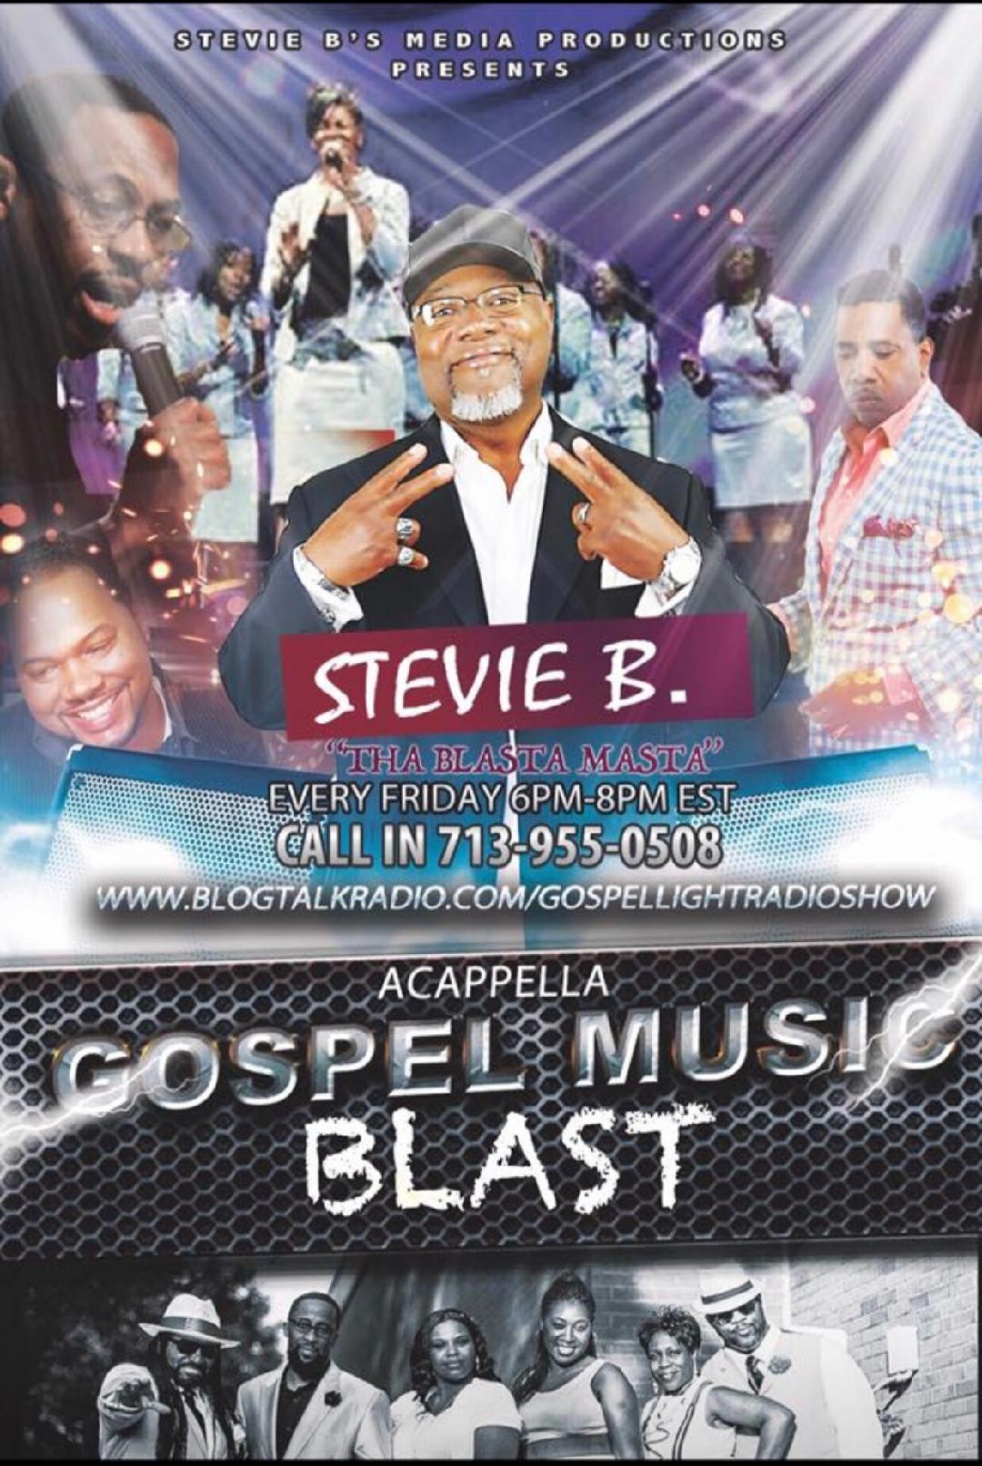 Stevie B's Media Productions - immagine di copertina